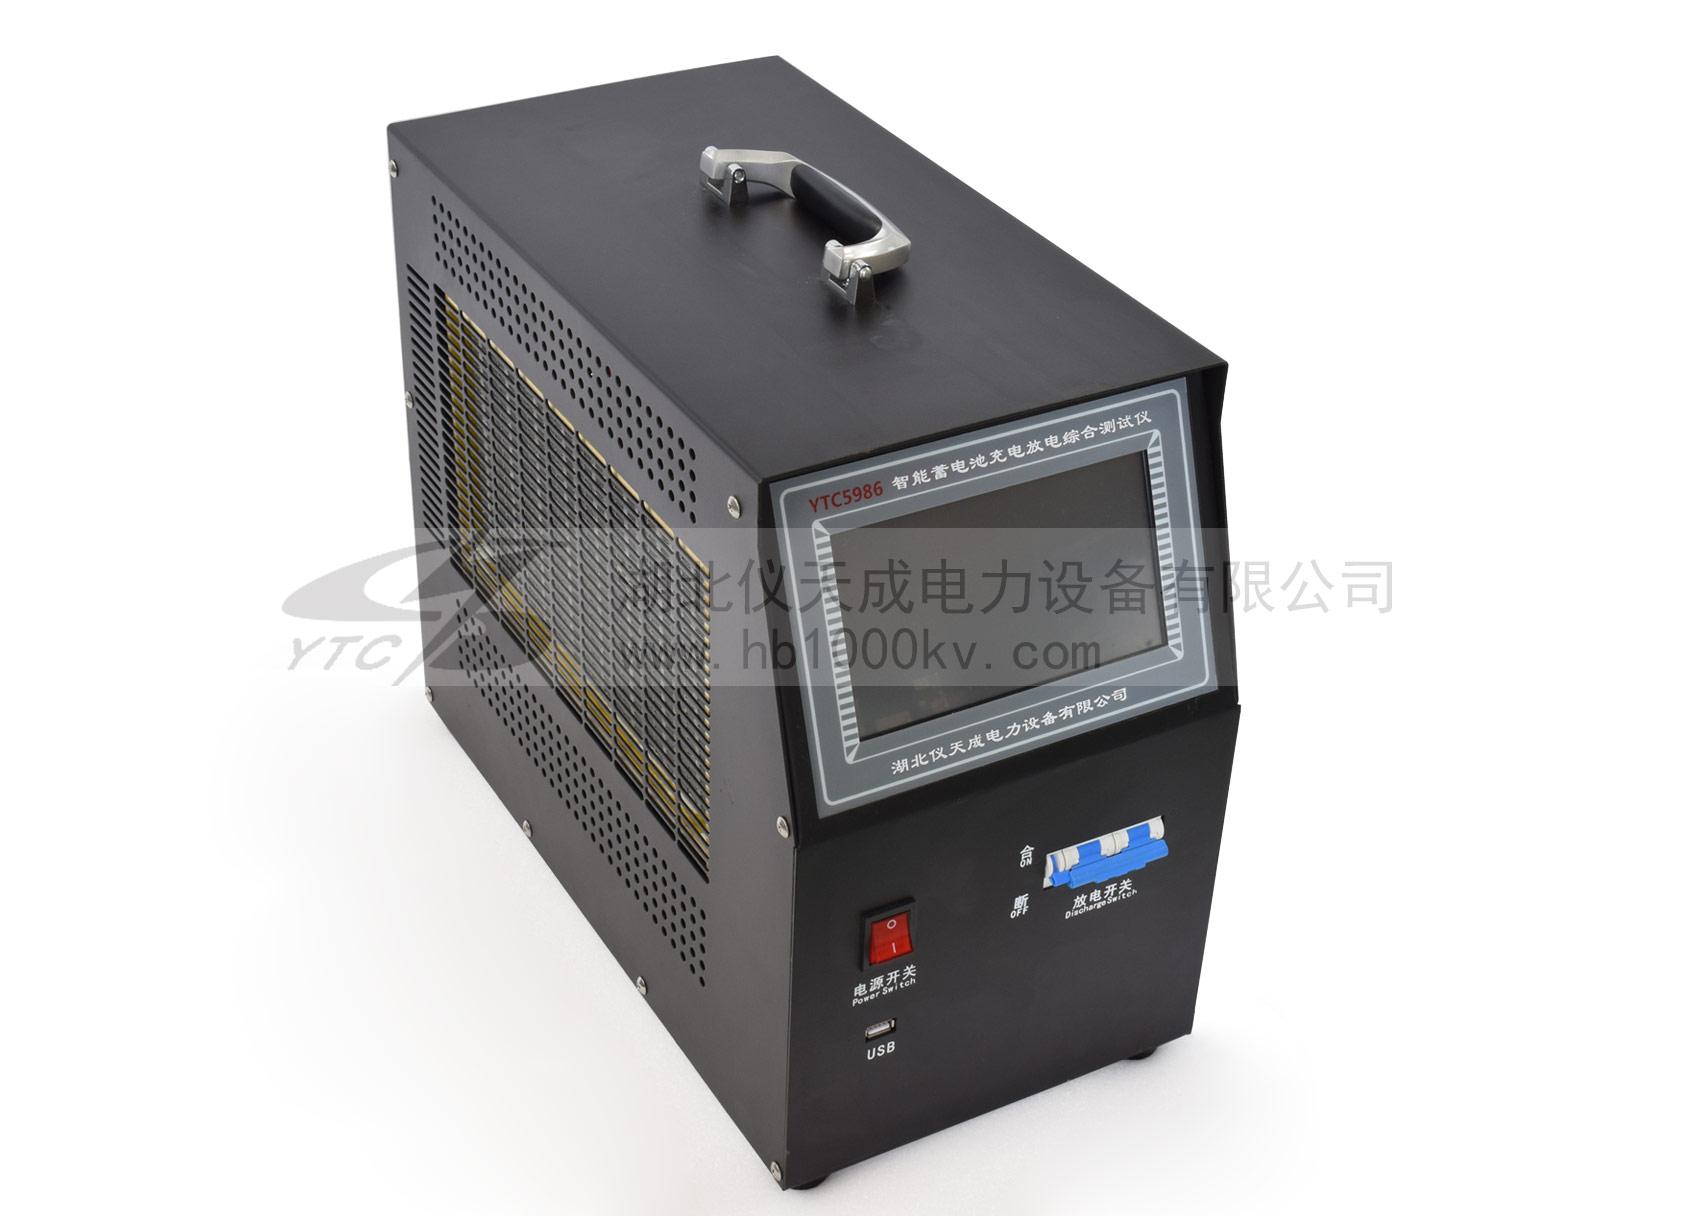 YTC5986智能蓄电池充电放电综合测试仪主机